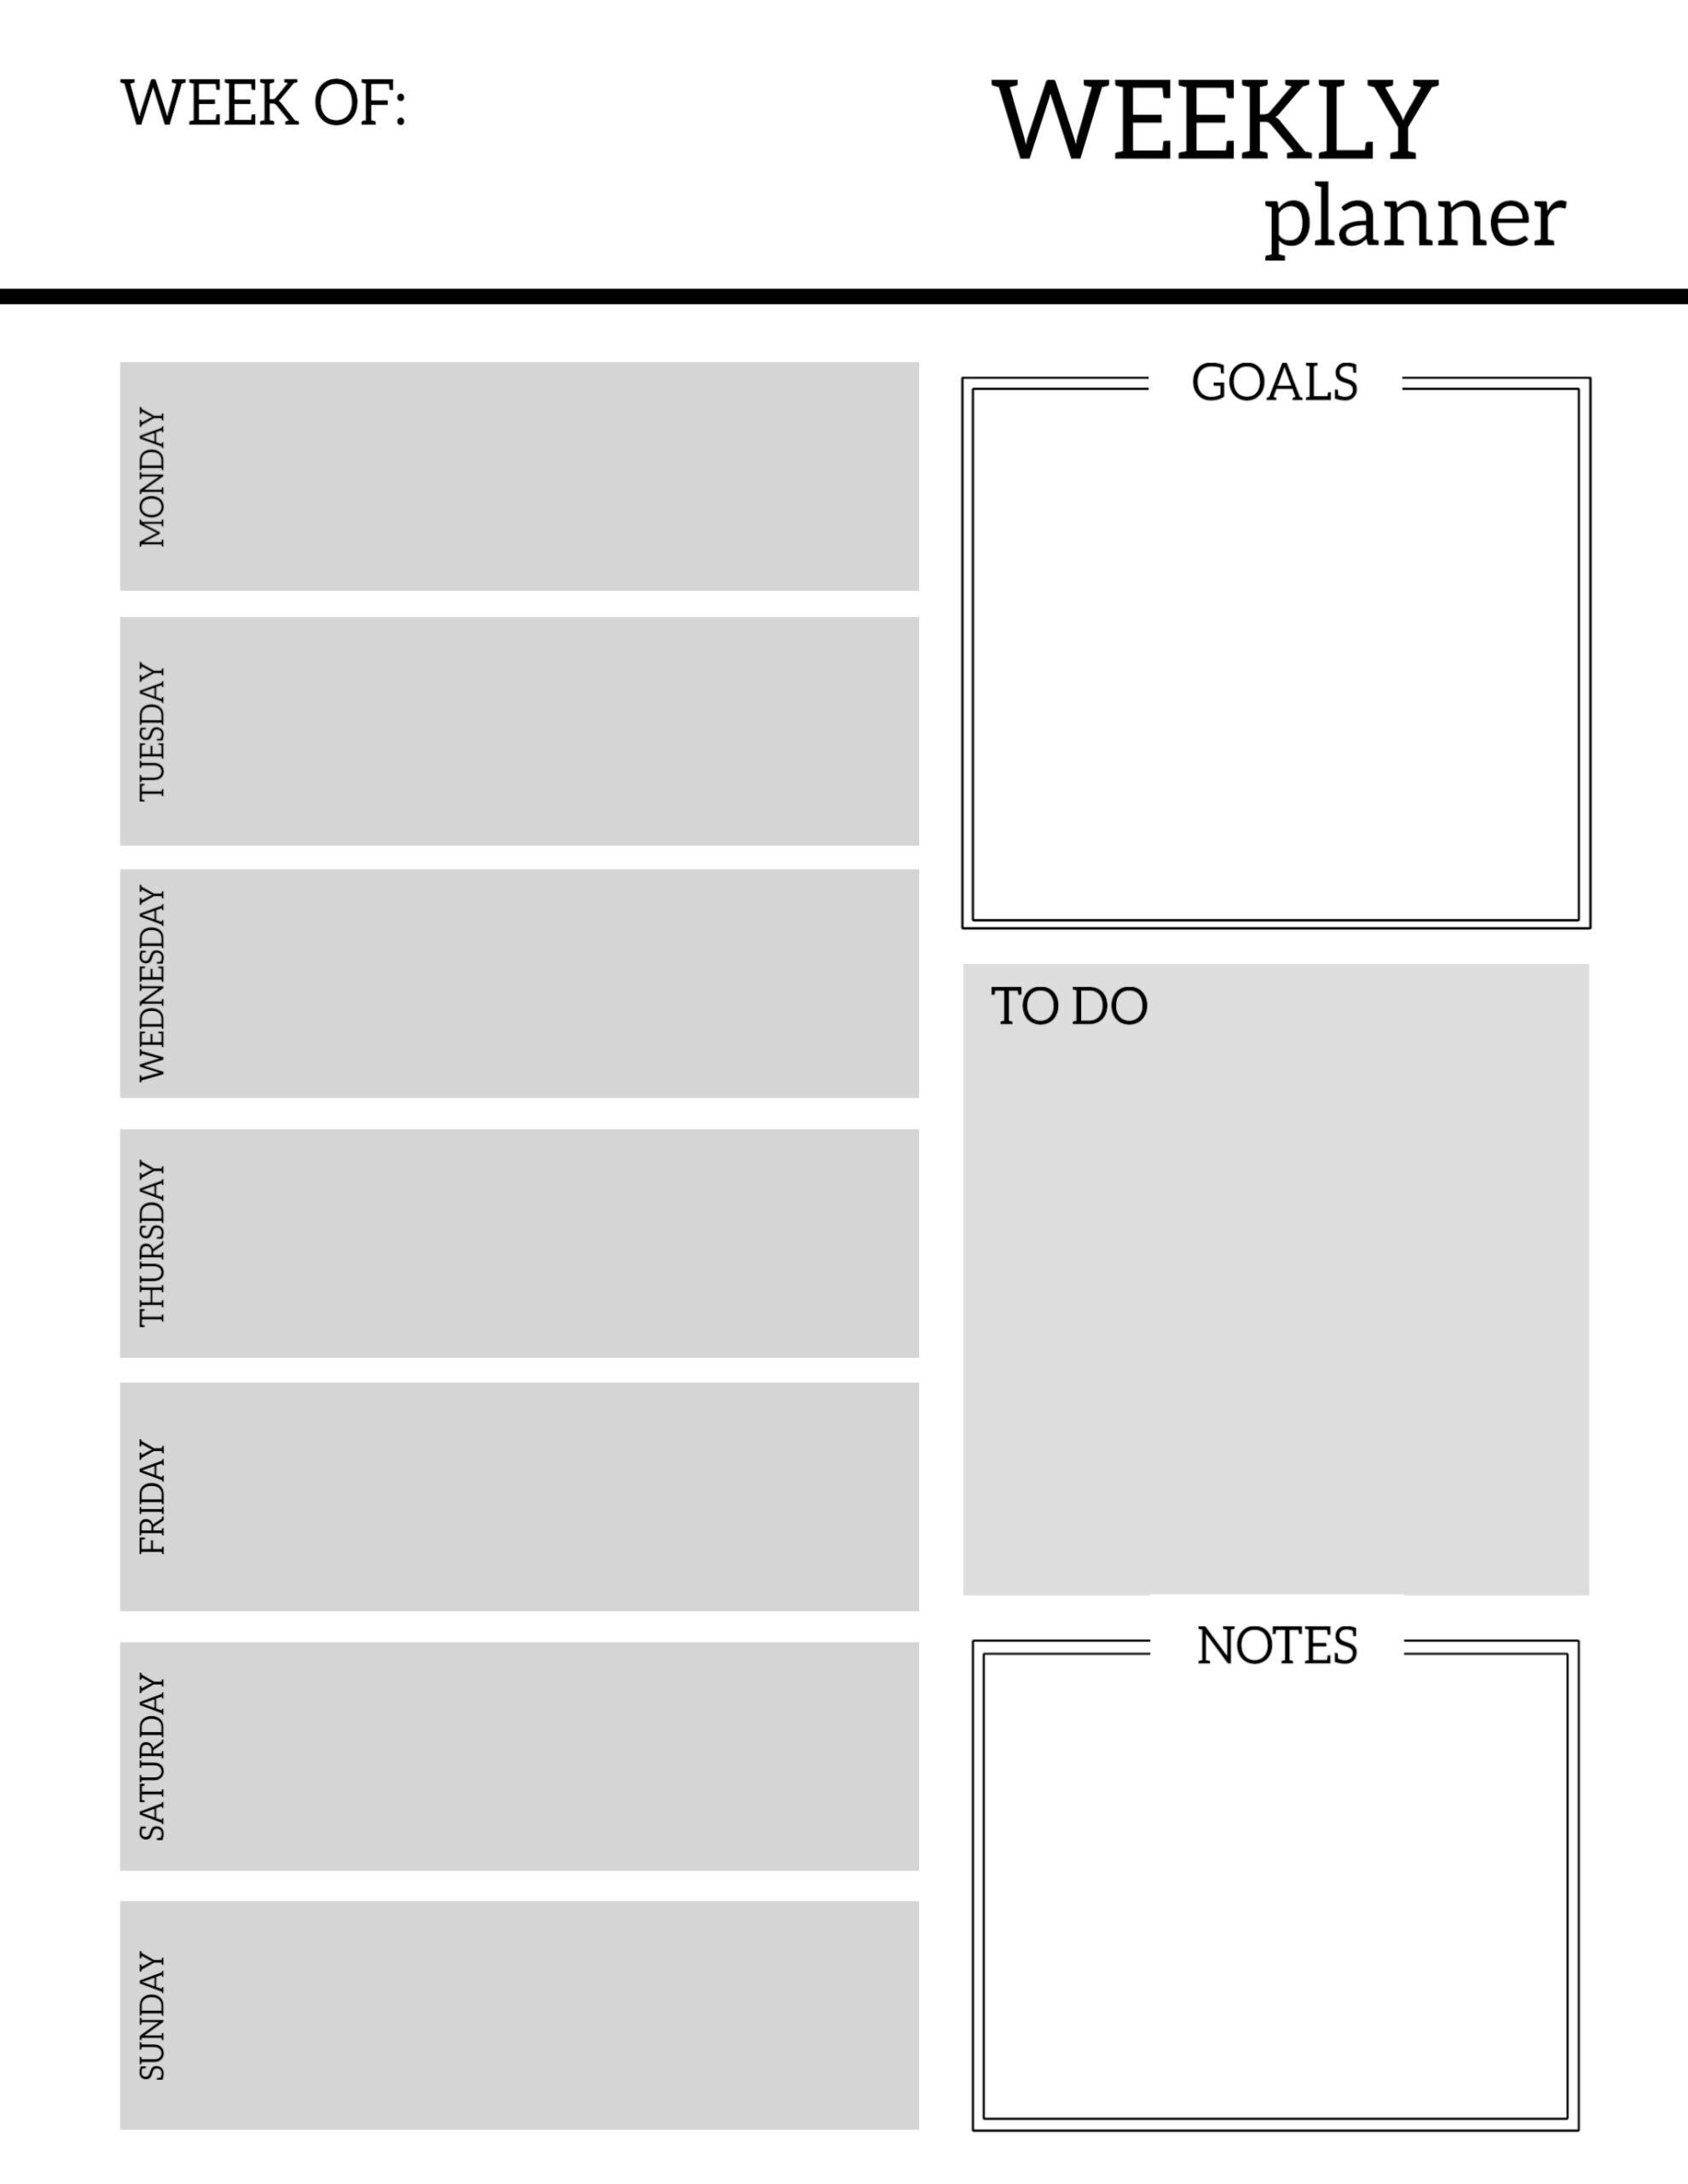 Free Printable Weekly Planner Pages